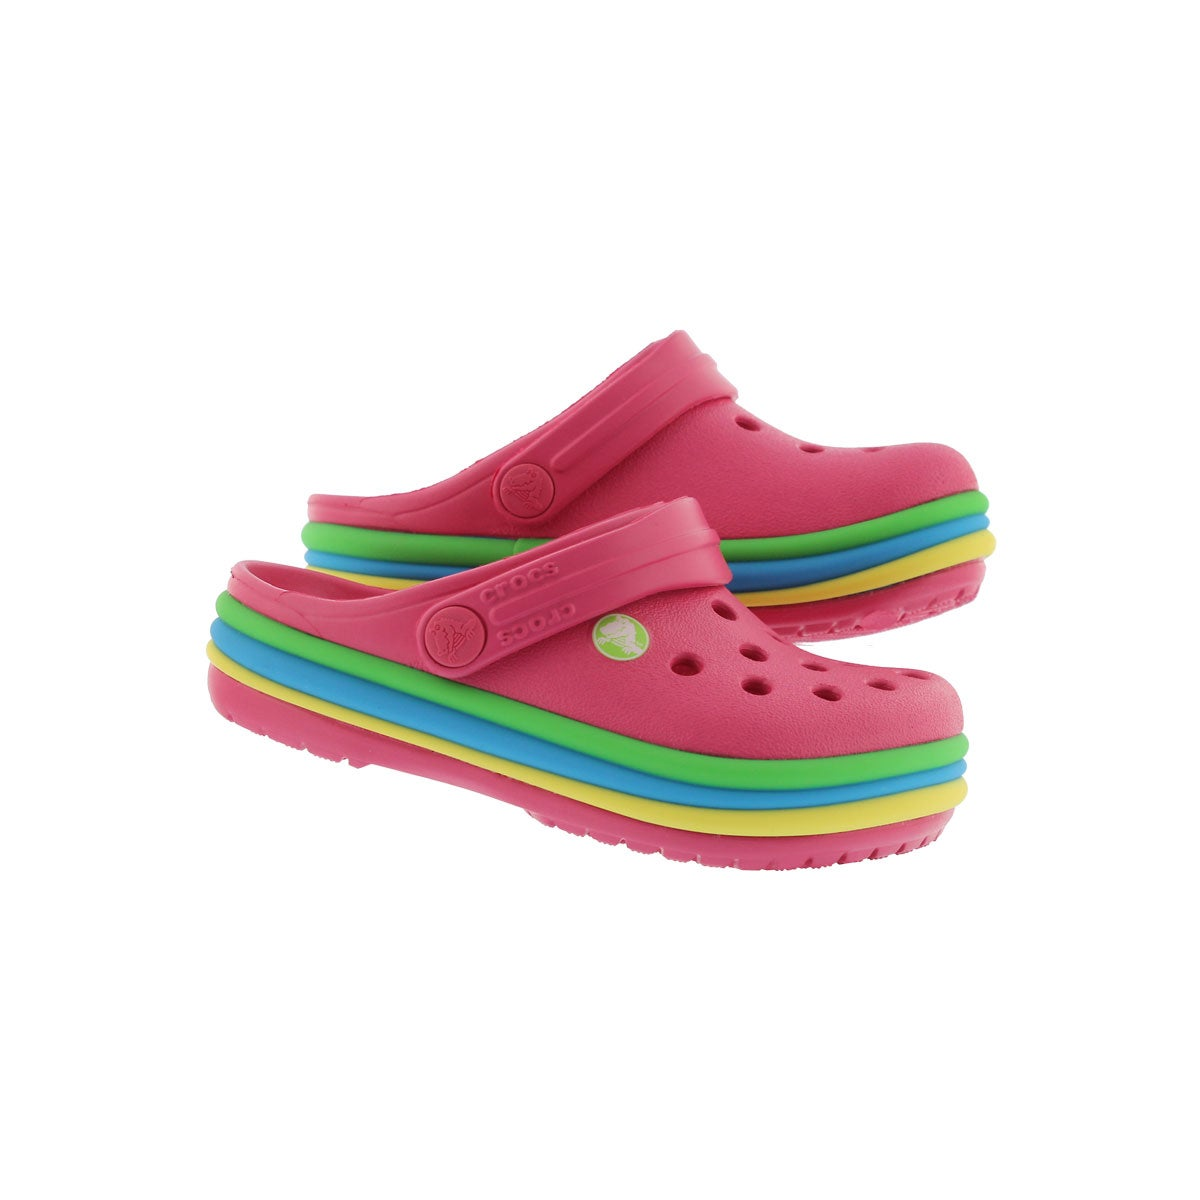 Infs-g CB Rainbow Band pink EVA clog